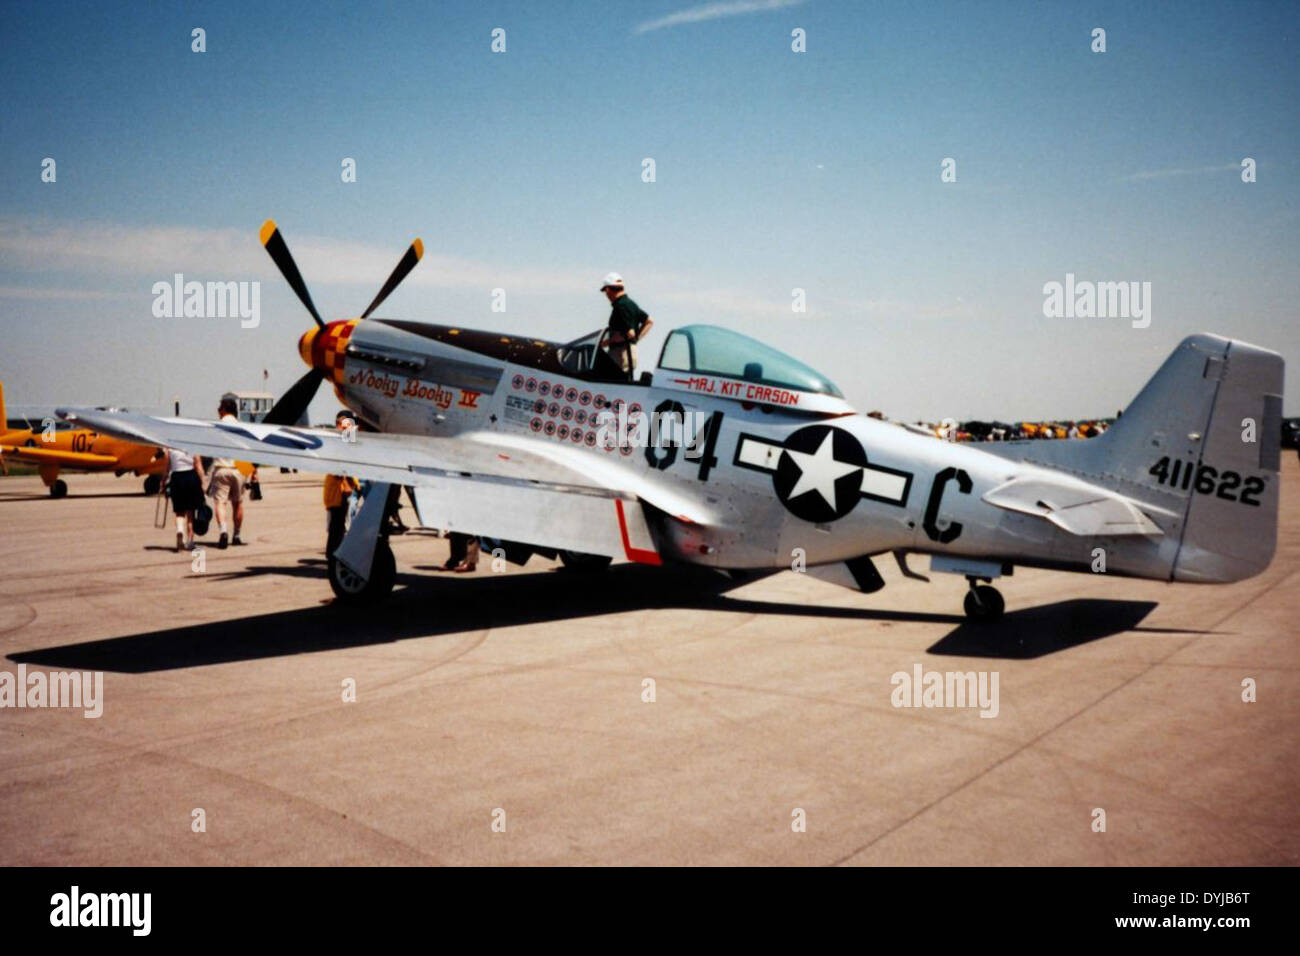 North American P-51 - Stock Image